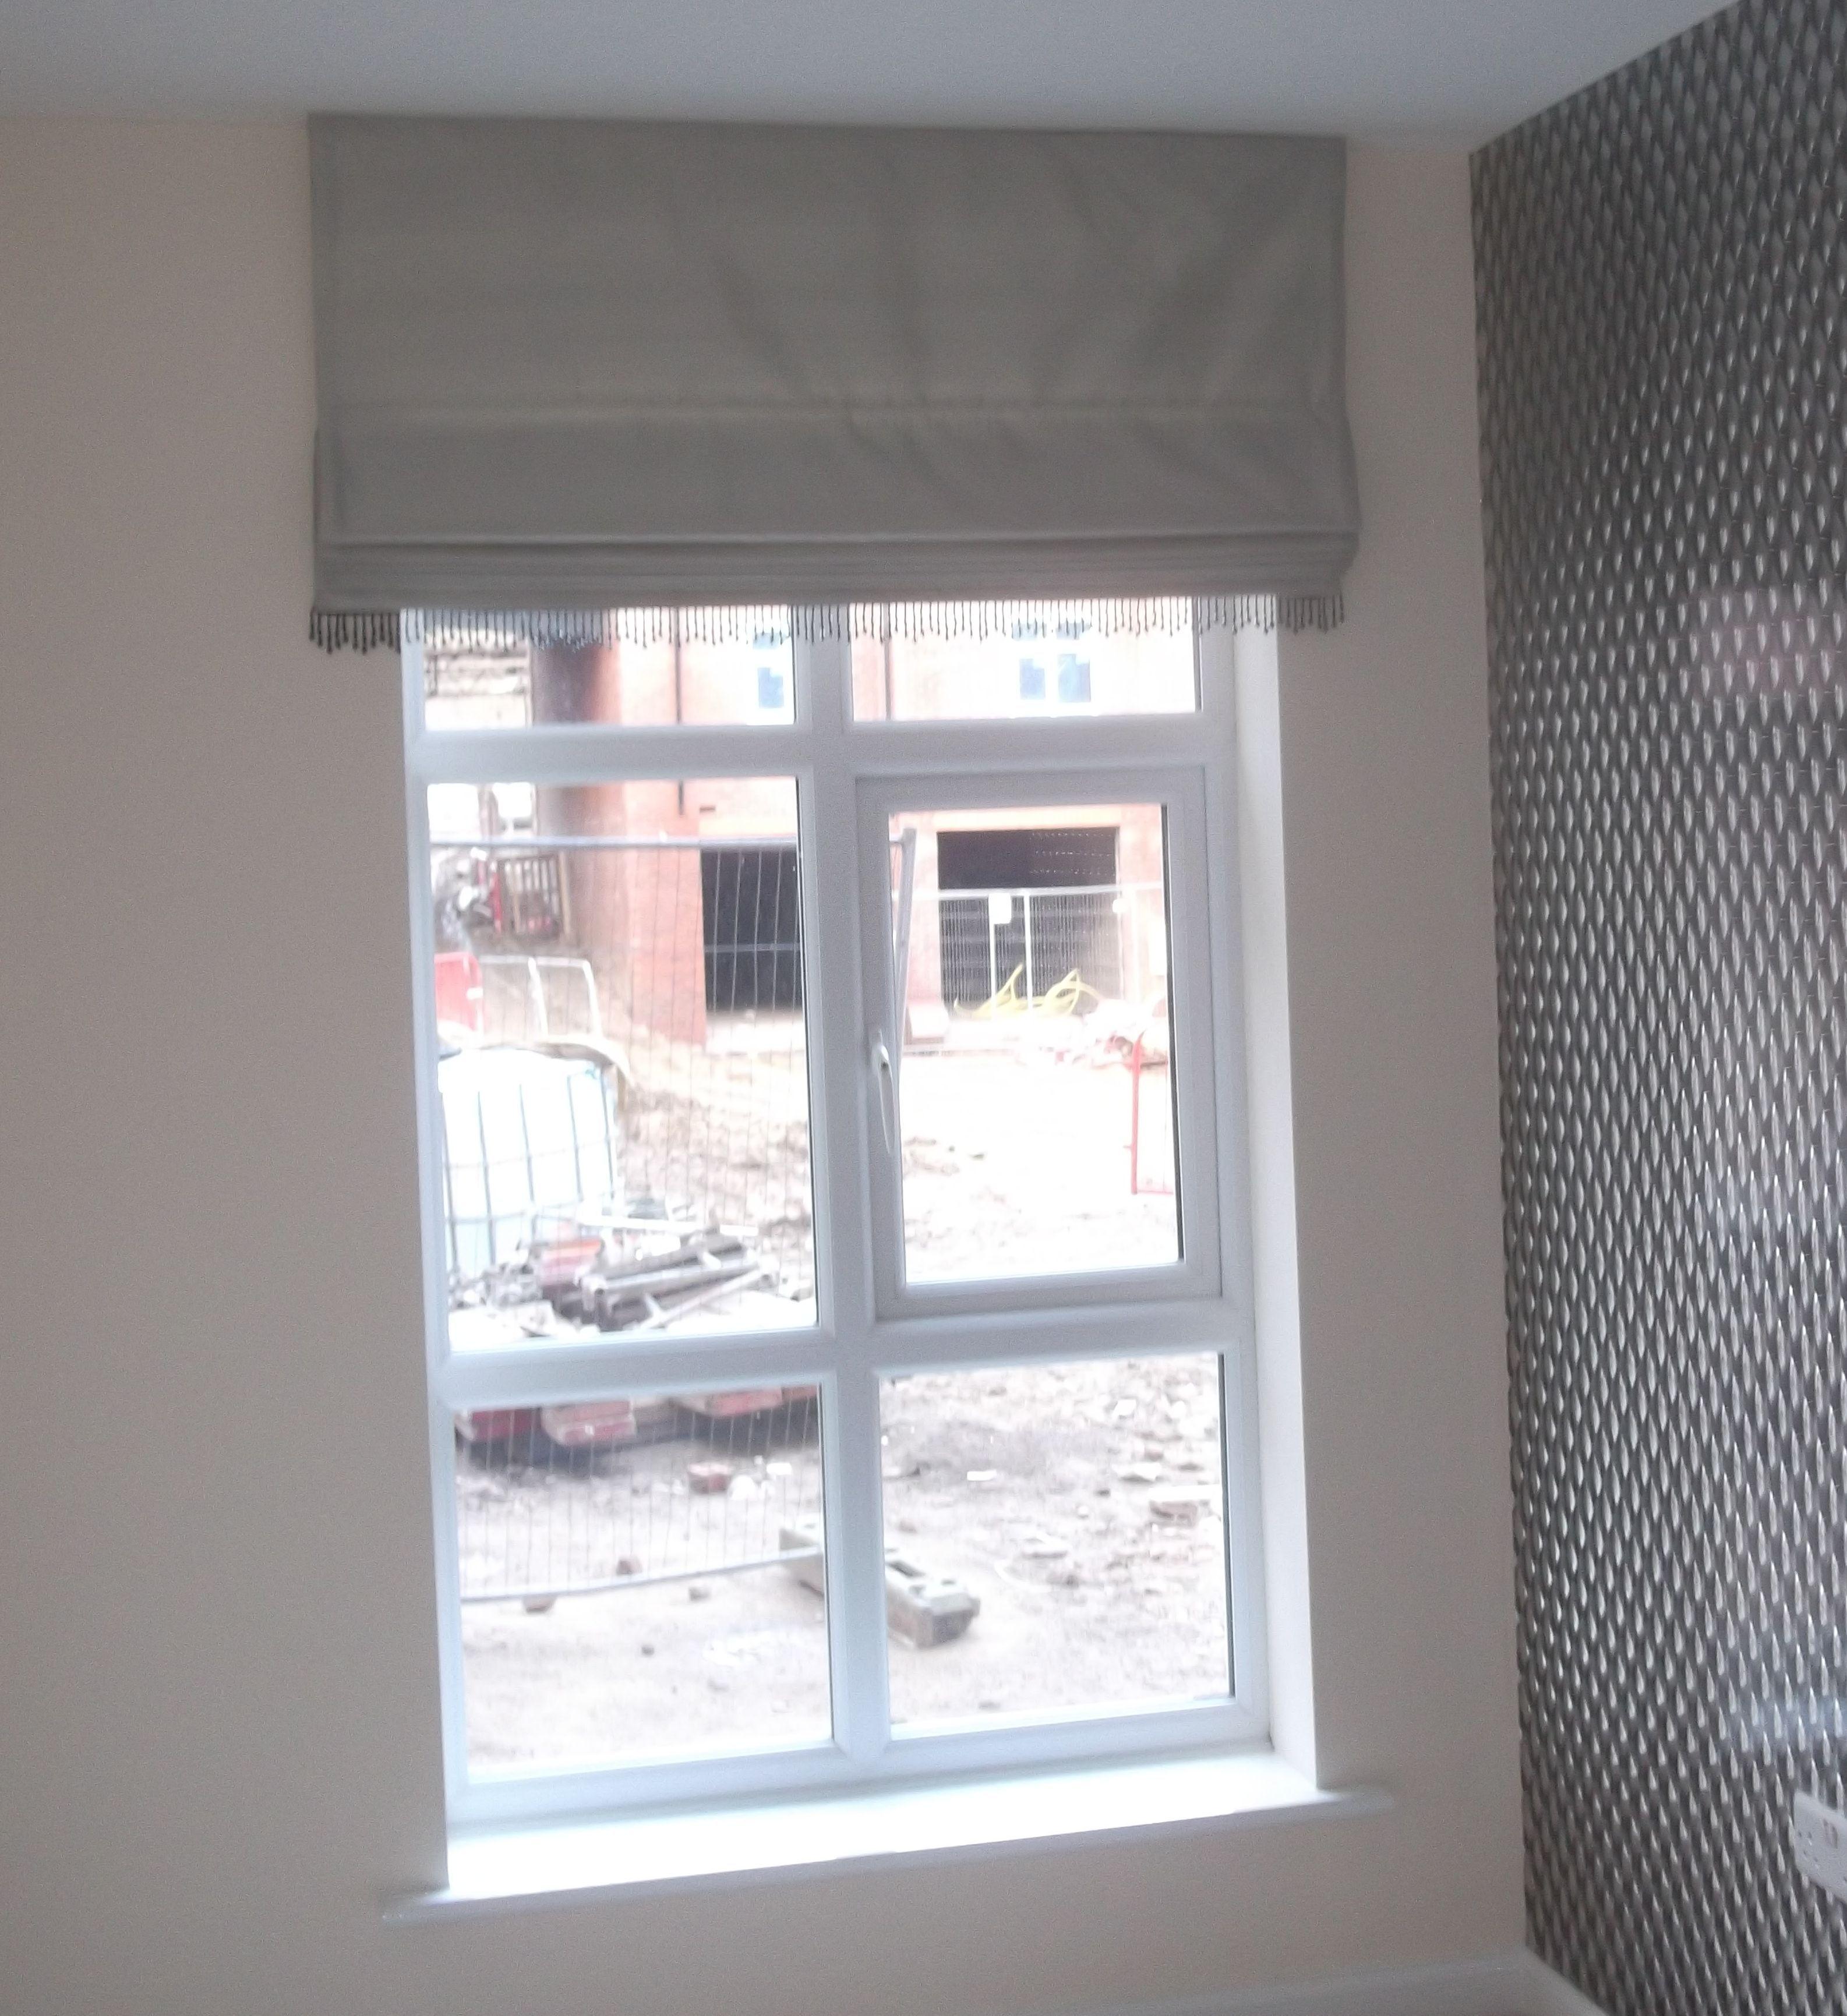 Hunting blind window ideas   stunning diy ideas shutter blinds gray grey blinds tileblinds